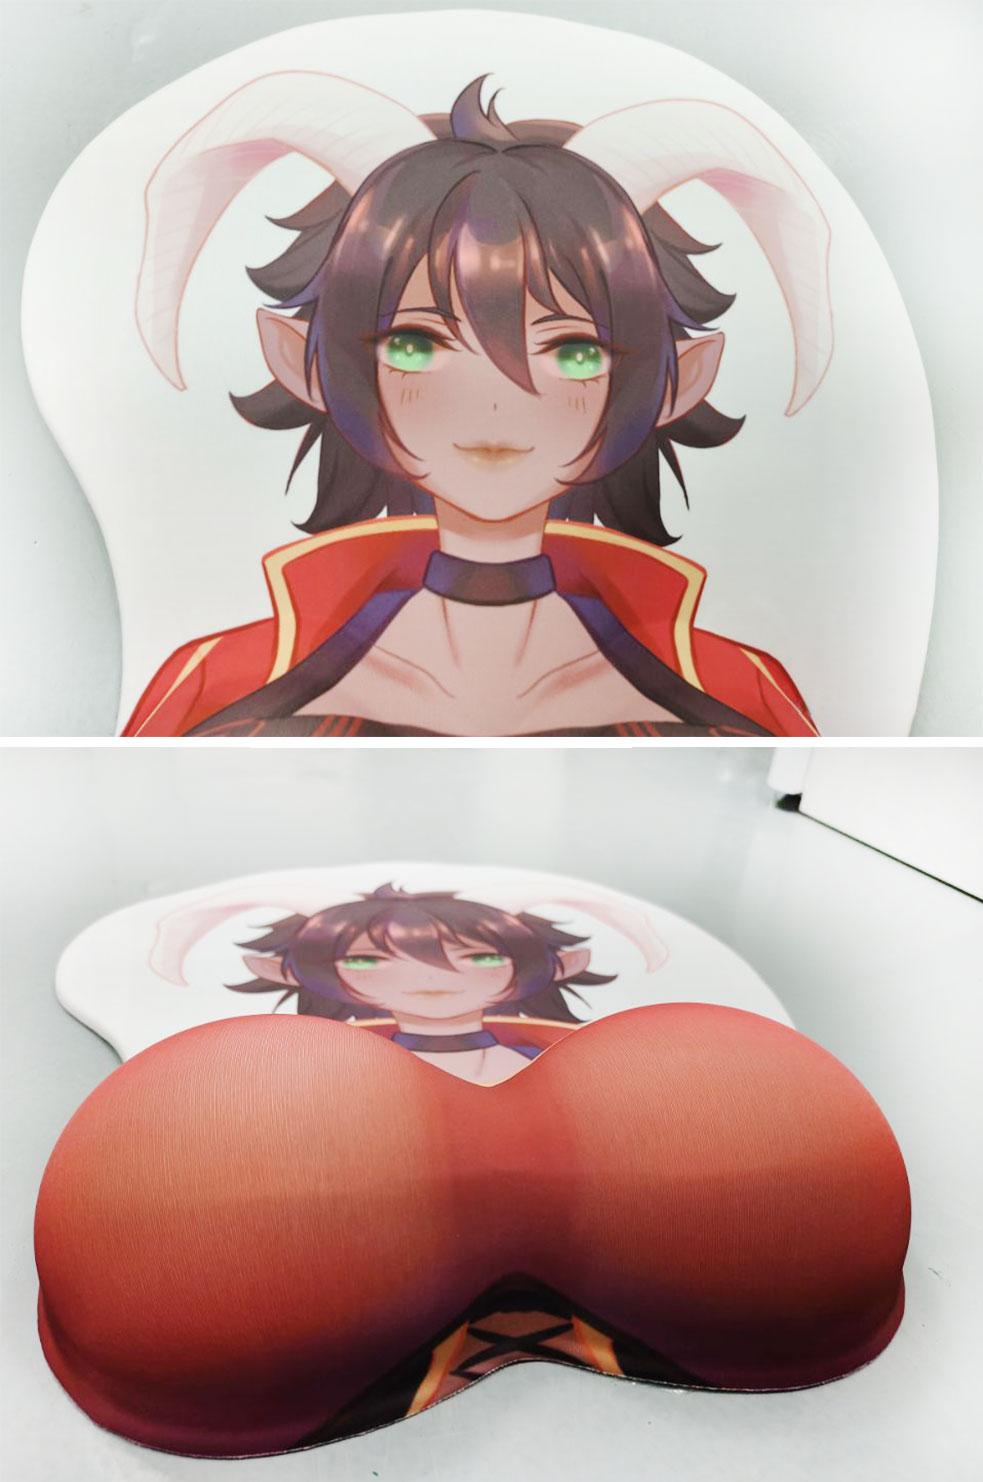 ahri life size oppai mousepad ahri giant oppai mouse pad 4903 - Anime Mousepads